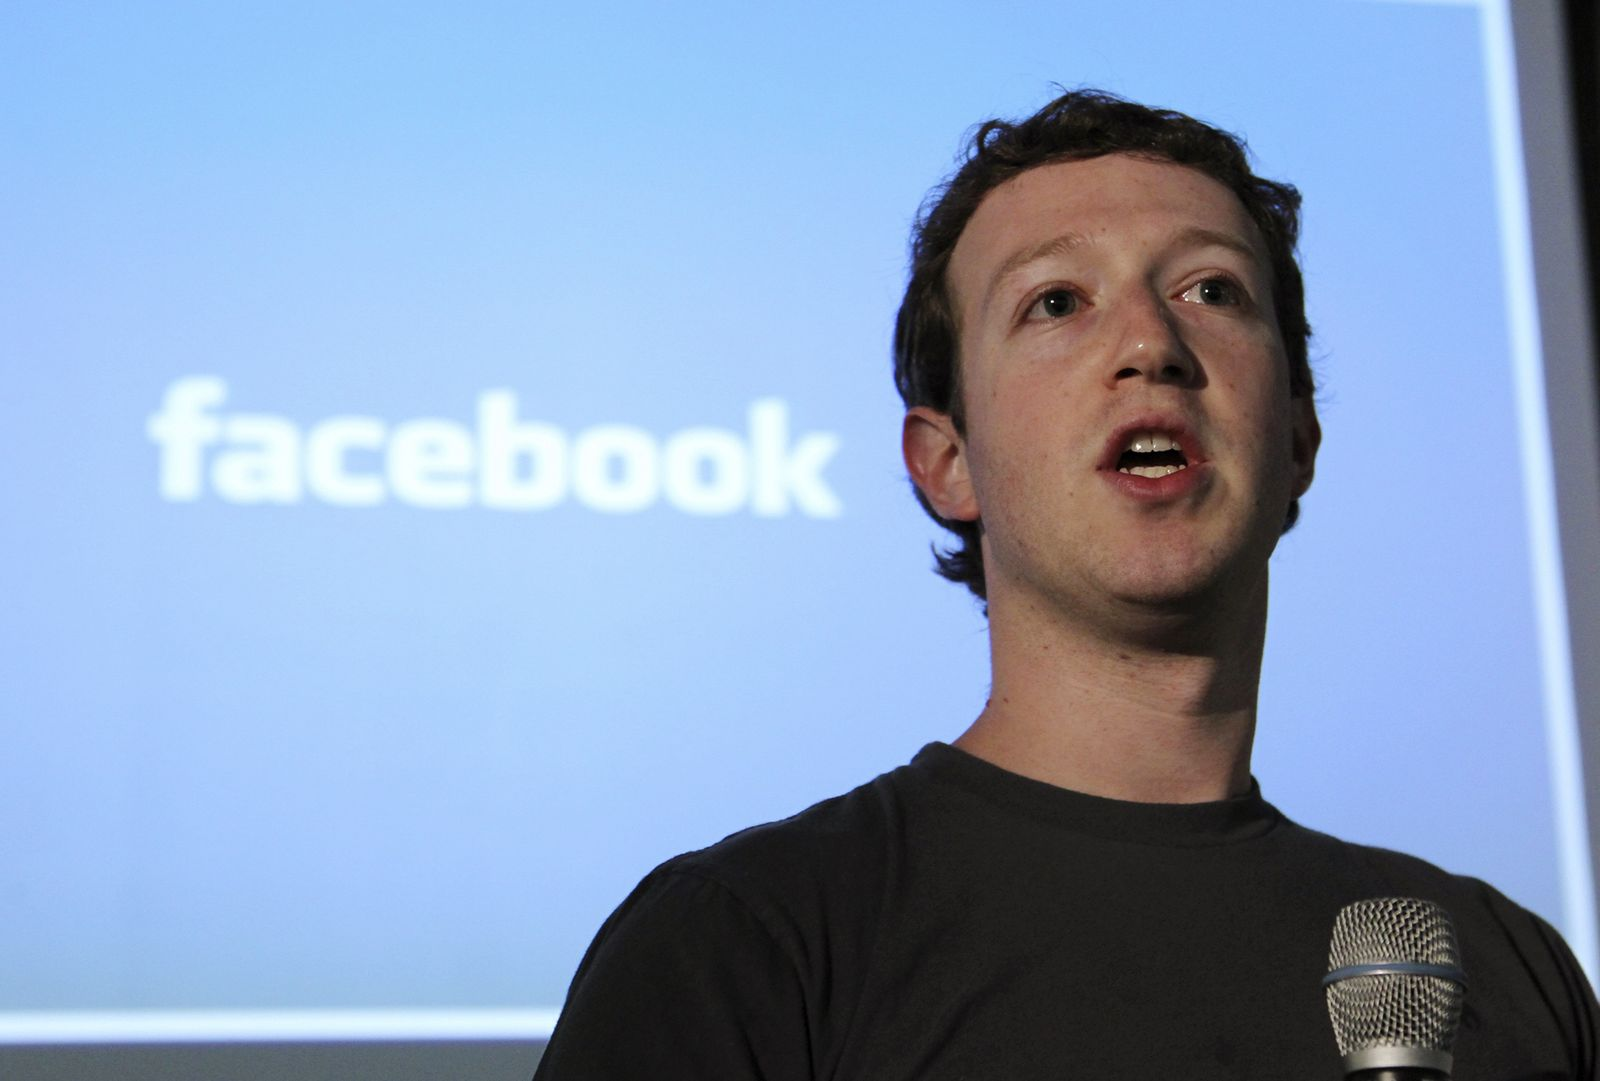 Zuckerberg / Facebook